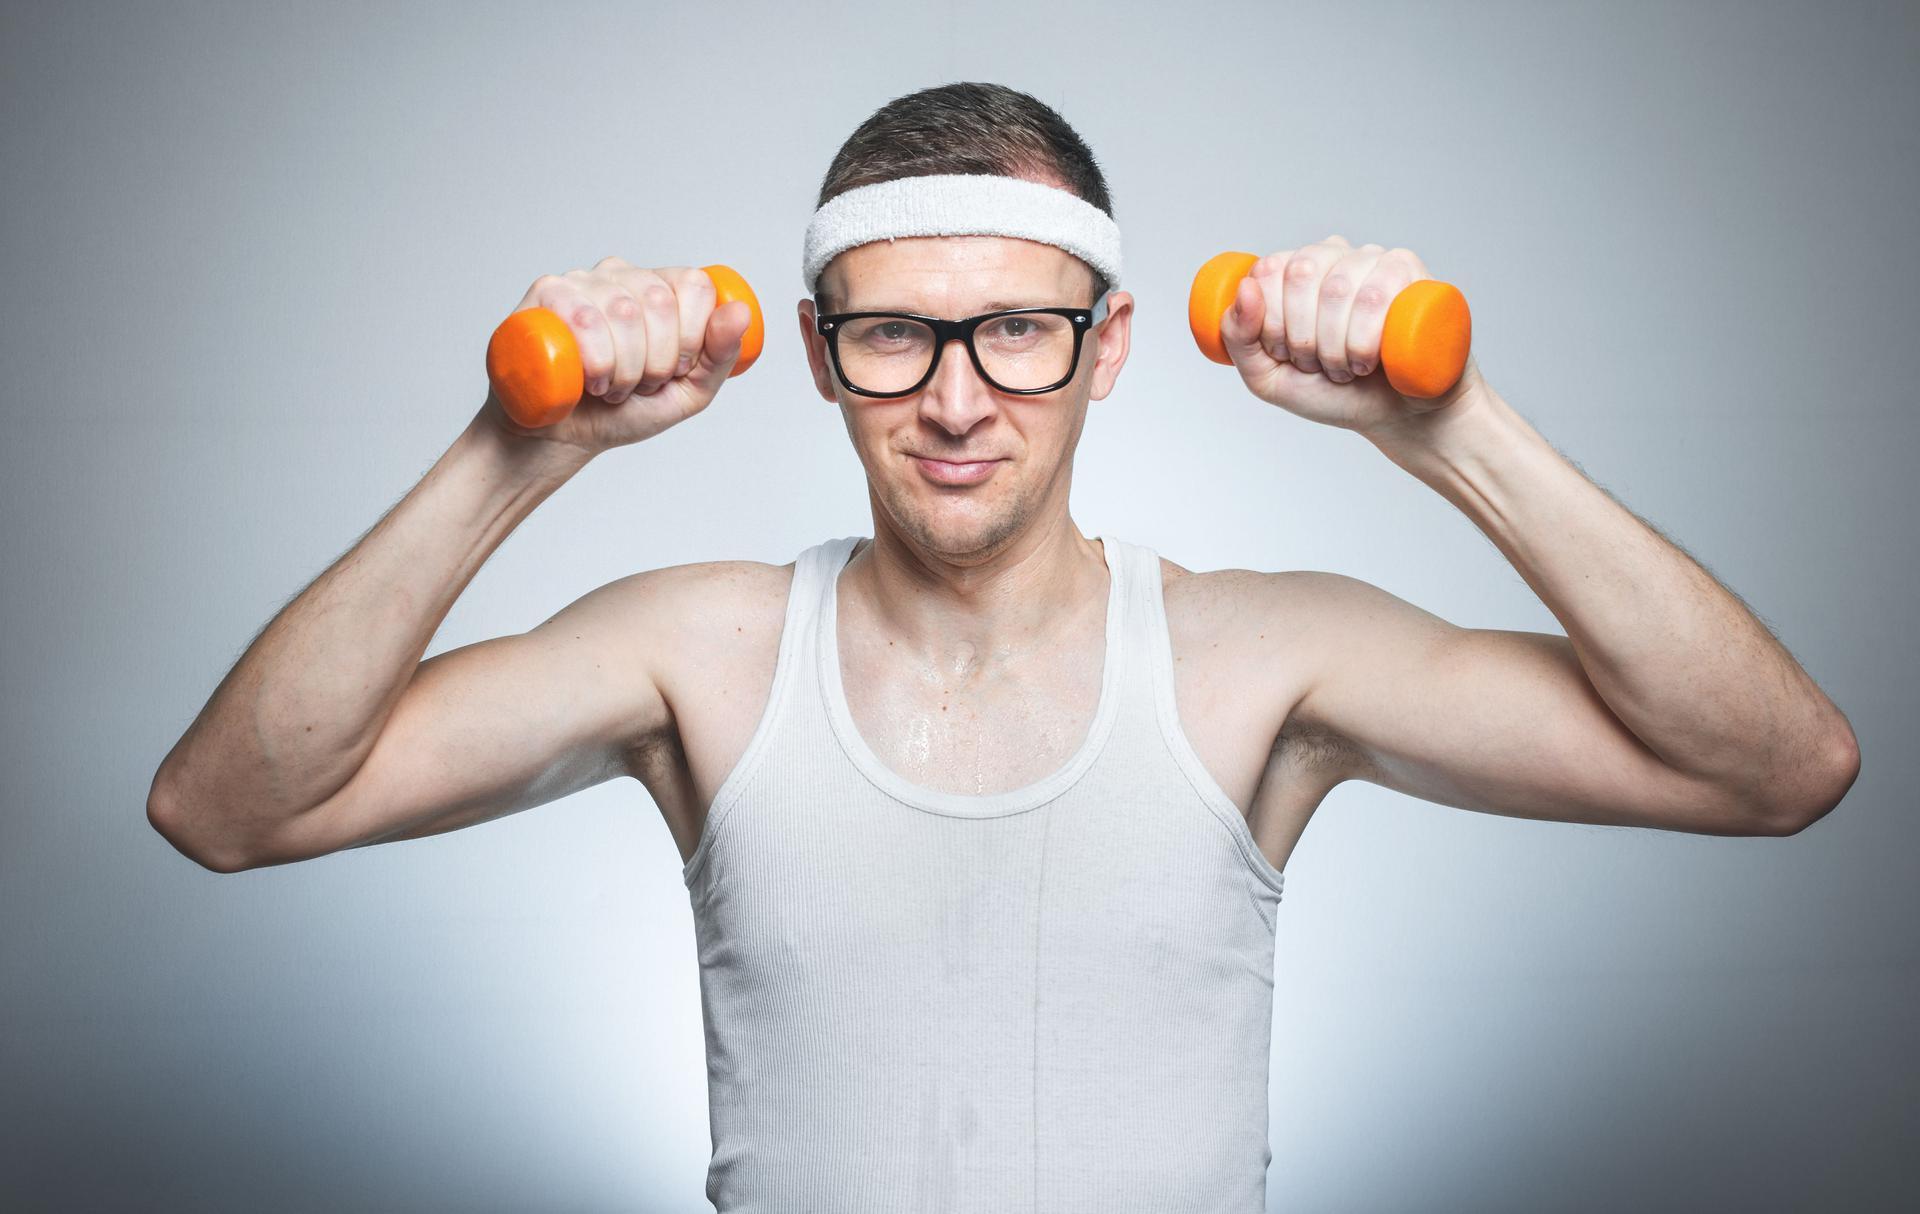 Kim Jest Ektomorfik Dieta I Trening Na Mase Dla Ektomorfika